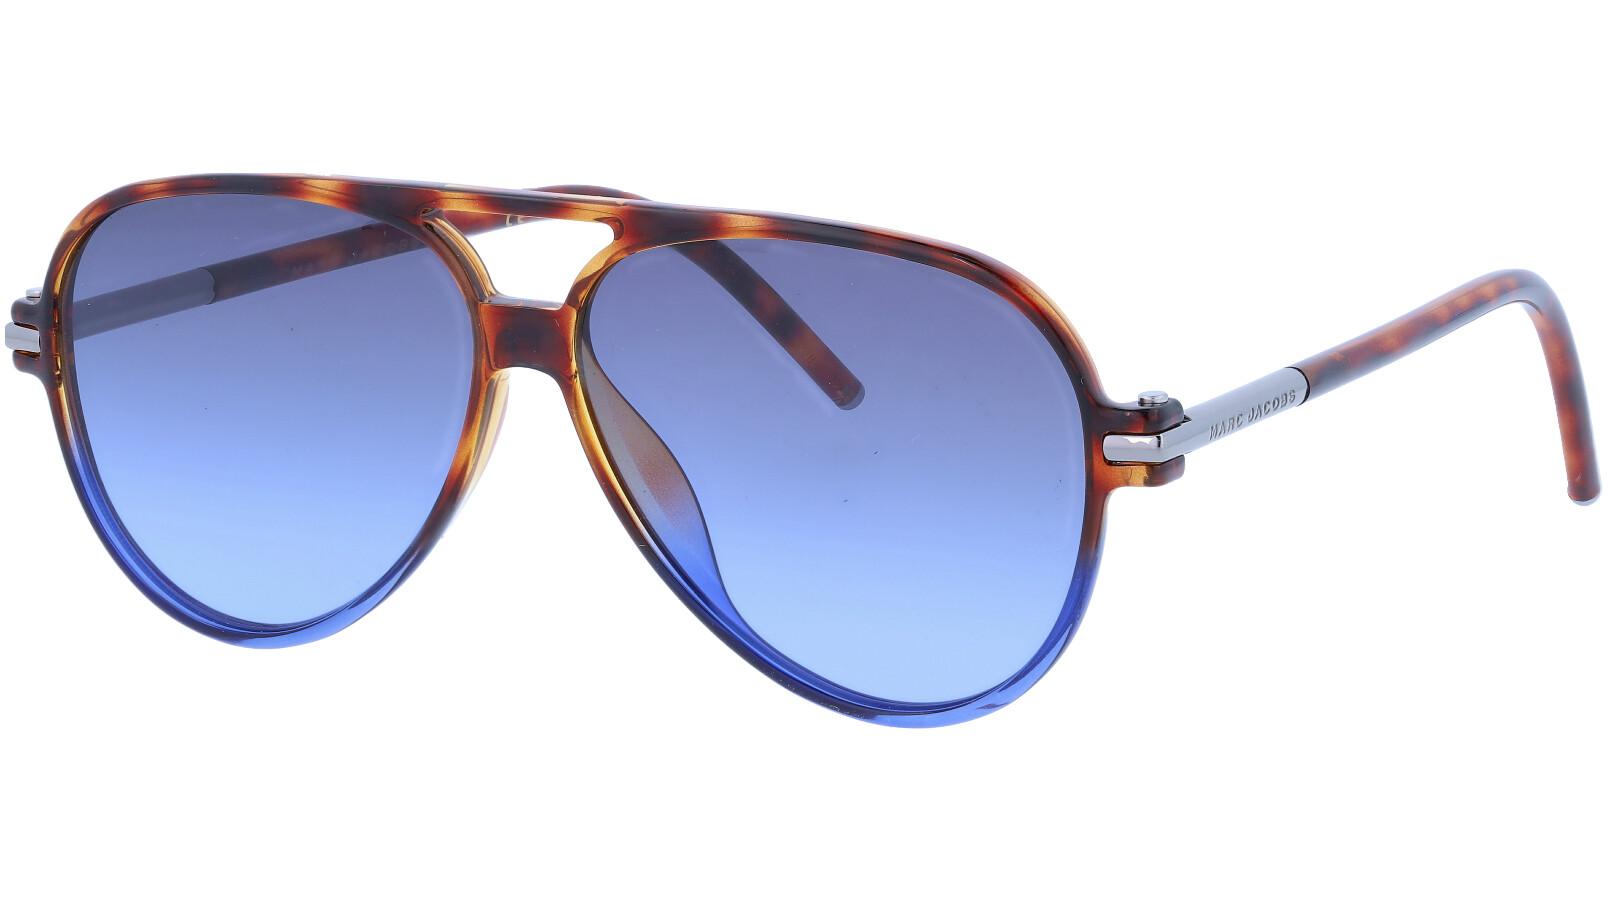 MARC JACOBS MARC44S TMRHL 56 HVNA Sunglasses